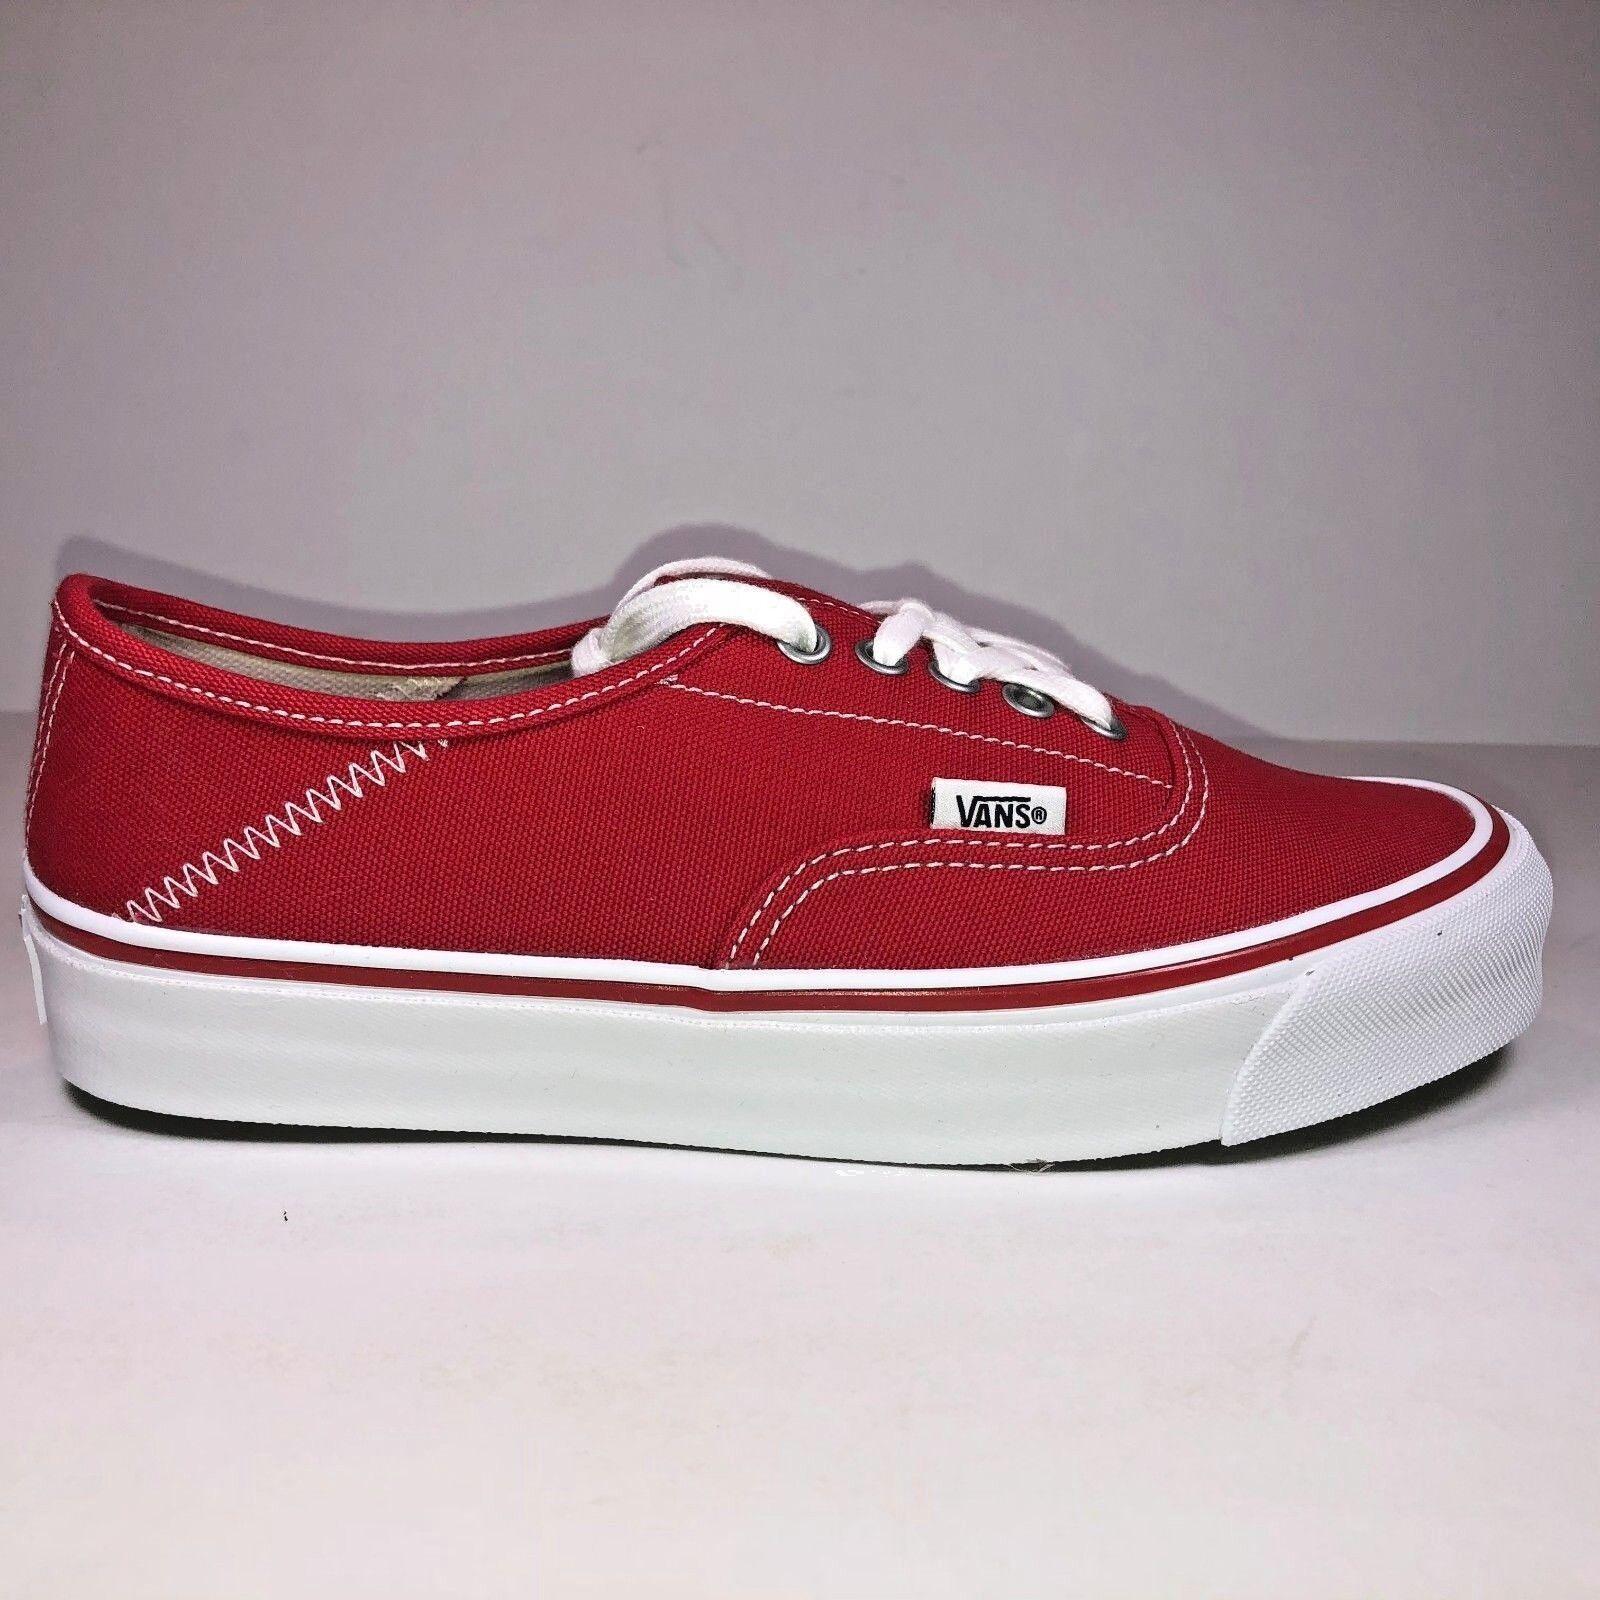 più preferenziale VANS ALYX OG Style 43 LX True rosso rosso rosso bianca Skateboard scarpe da ginnastica VN0A3DPBoro Dimensione 6  vendita calda